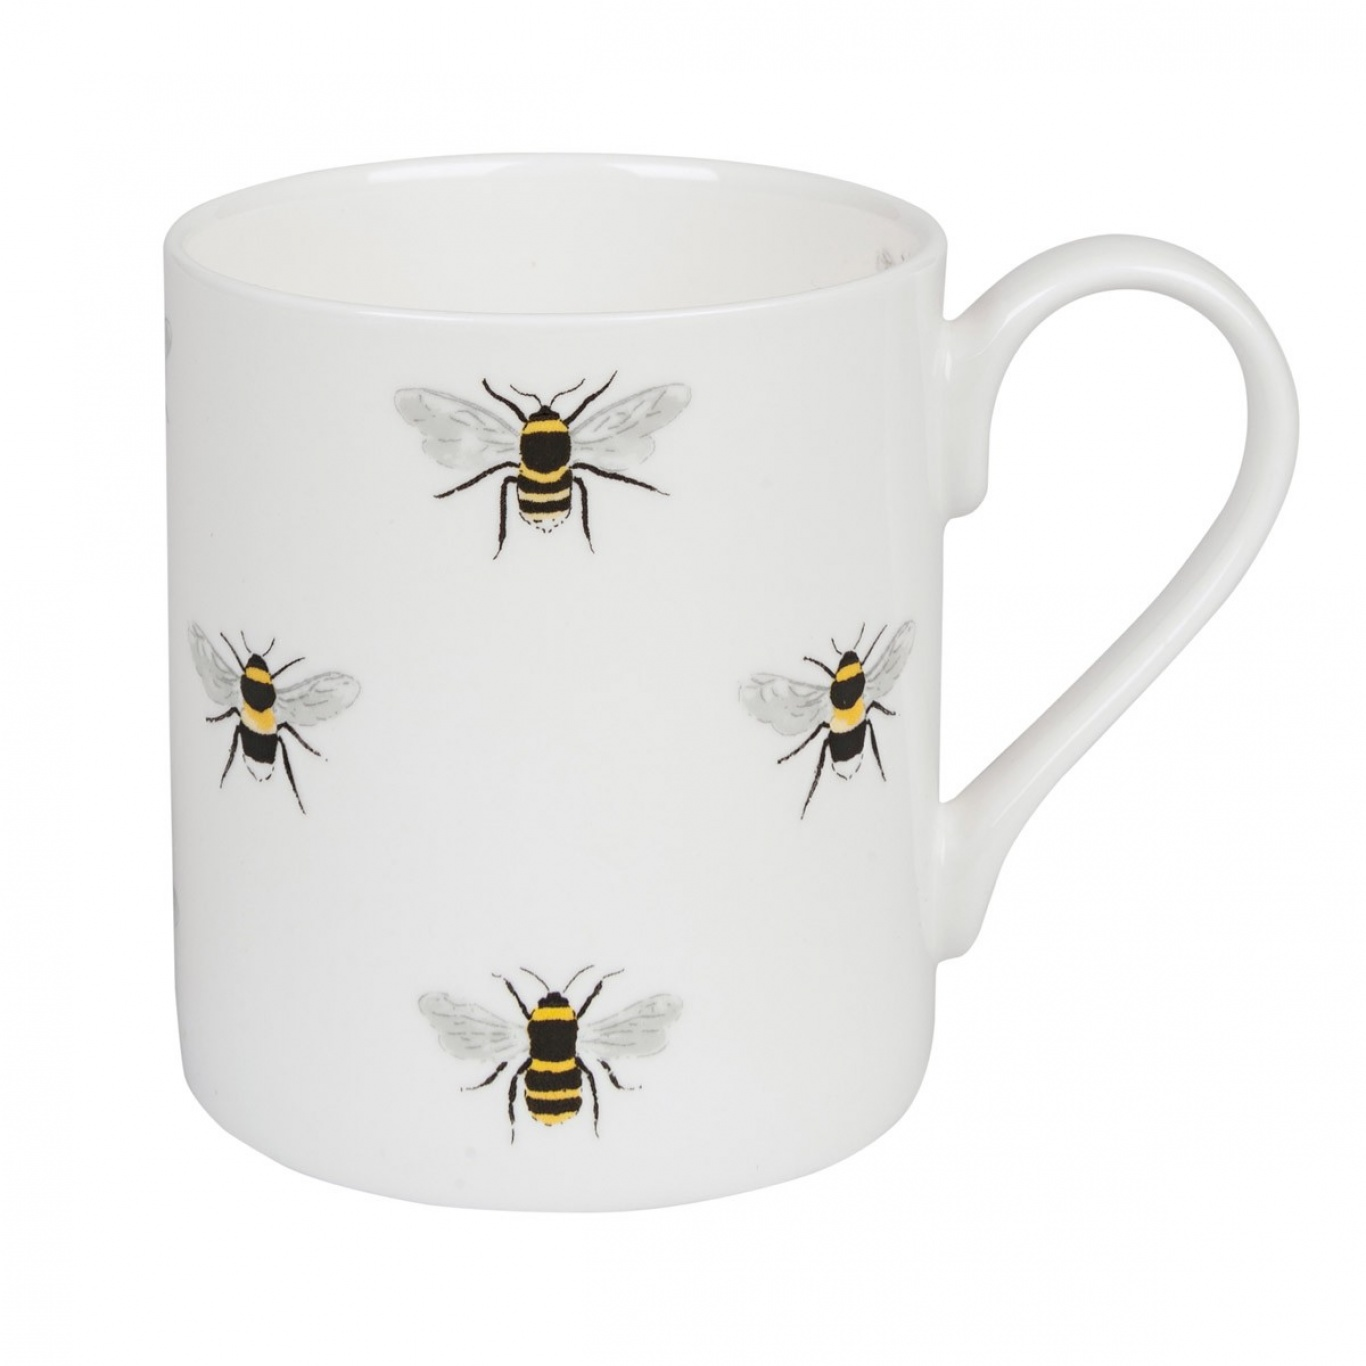 Image of Sophie Allport Bees White Mug Standard